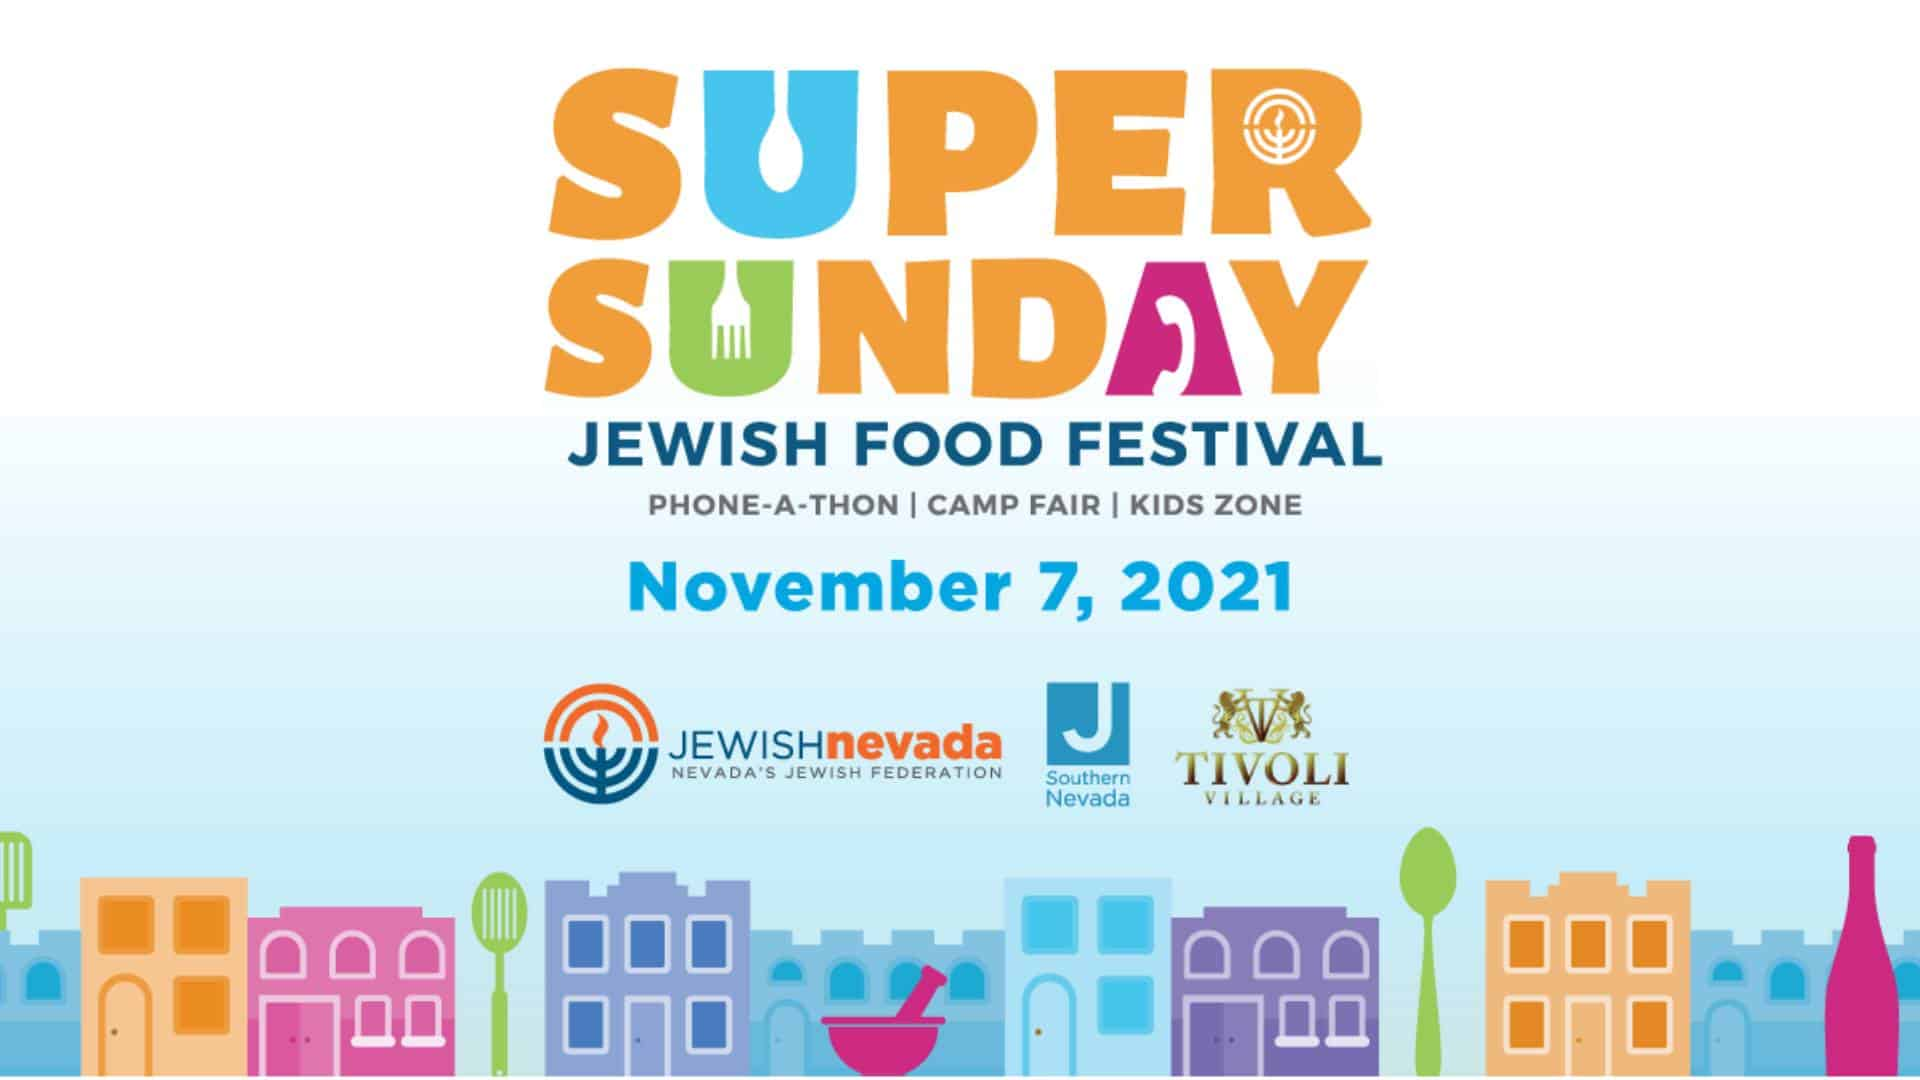 Super Sunday Jewish Food Festival